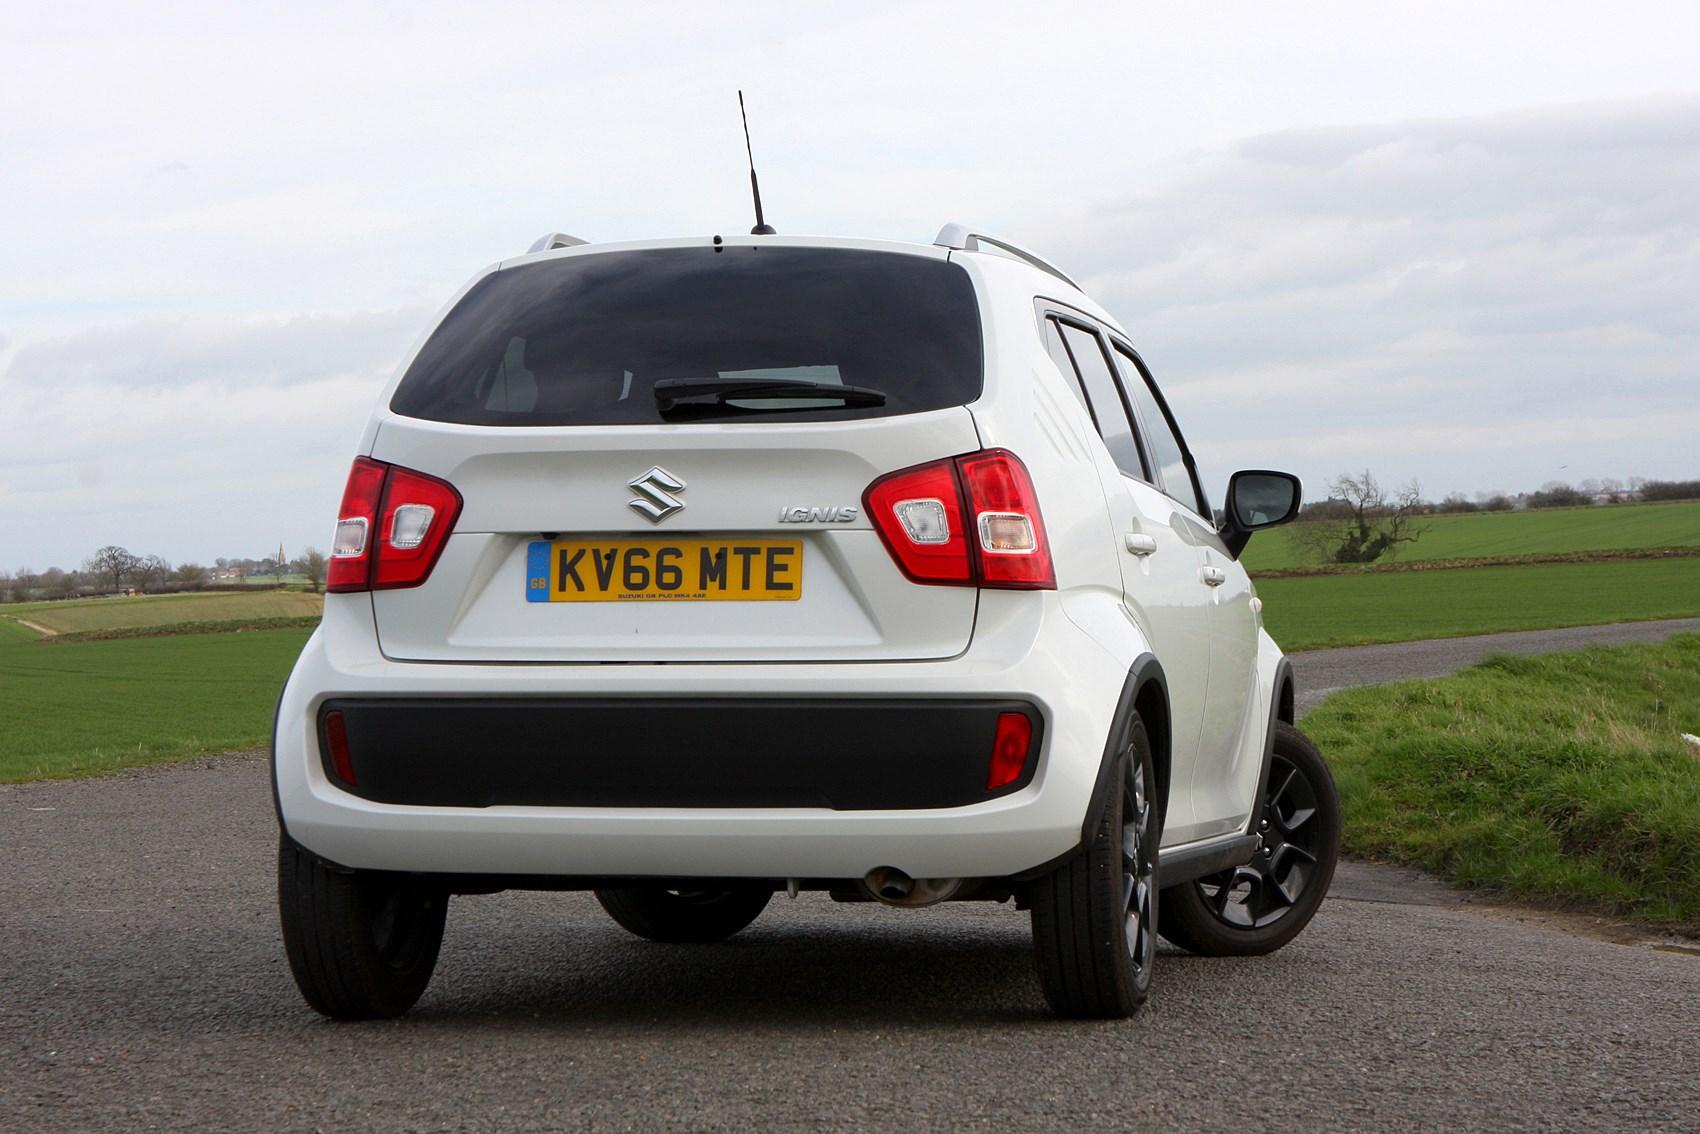 Suzuki Ignis long-term review